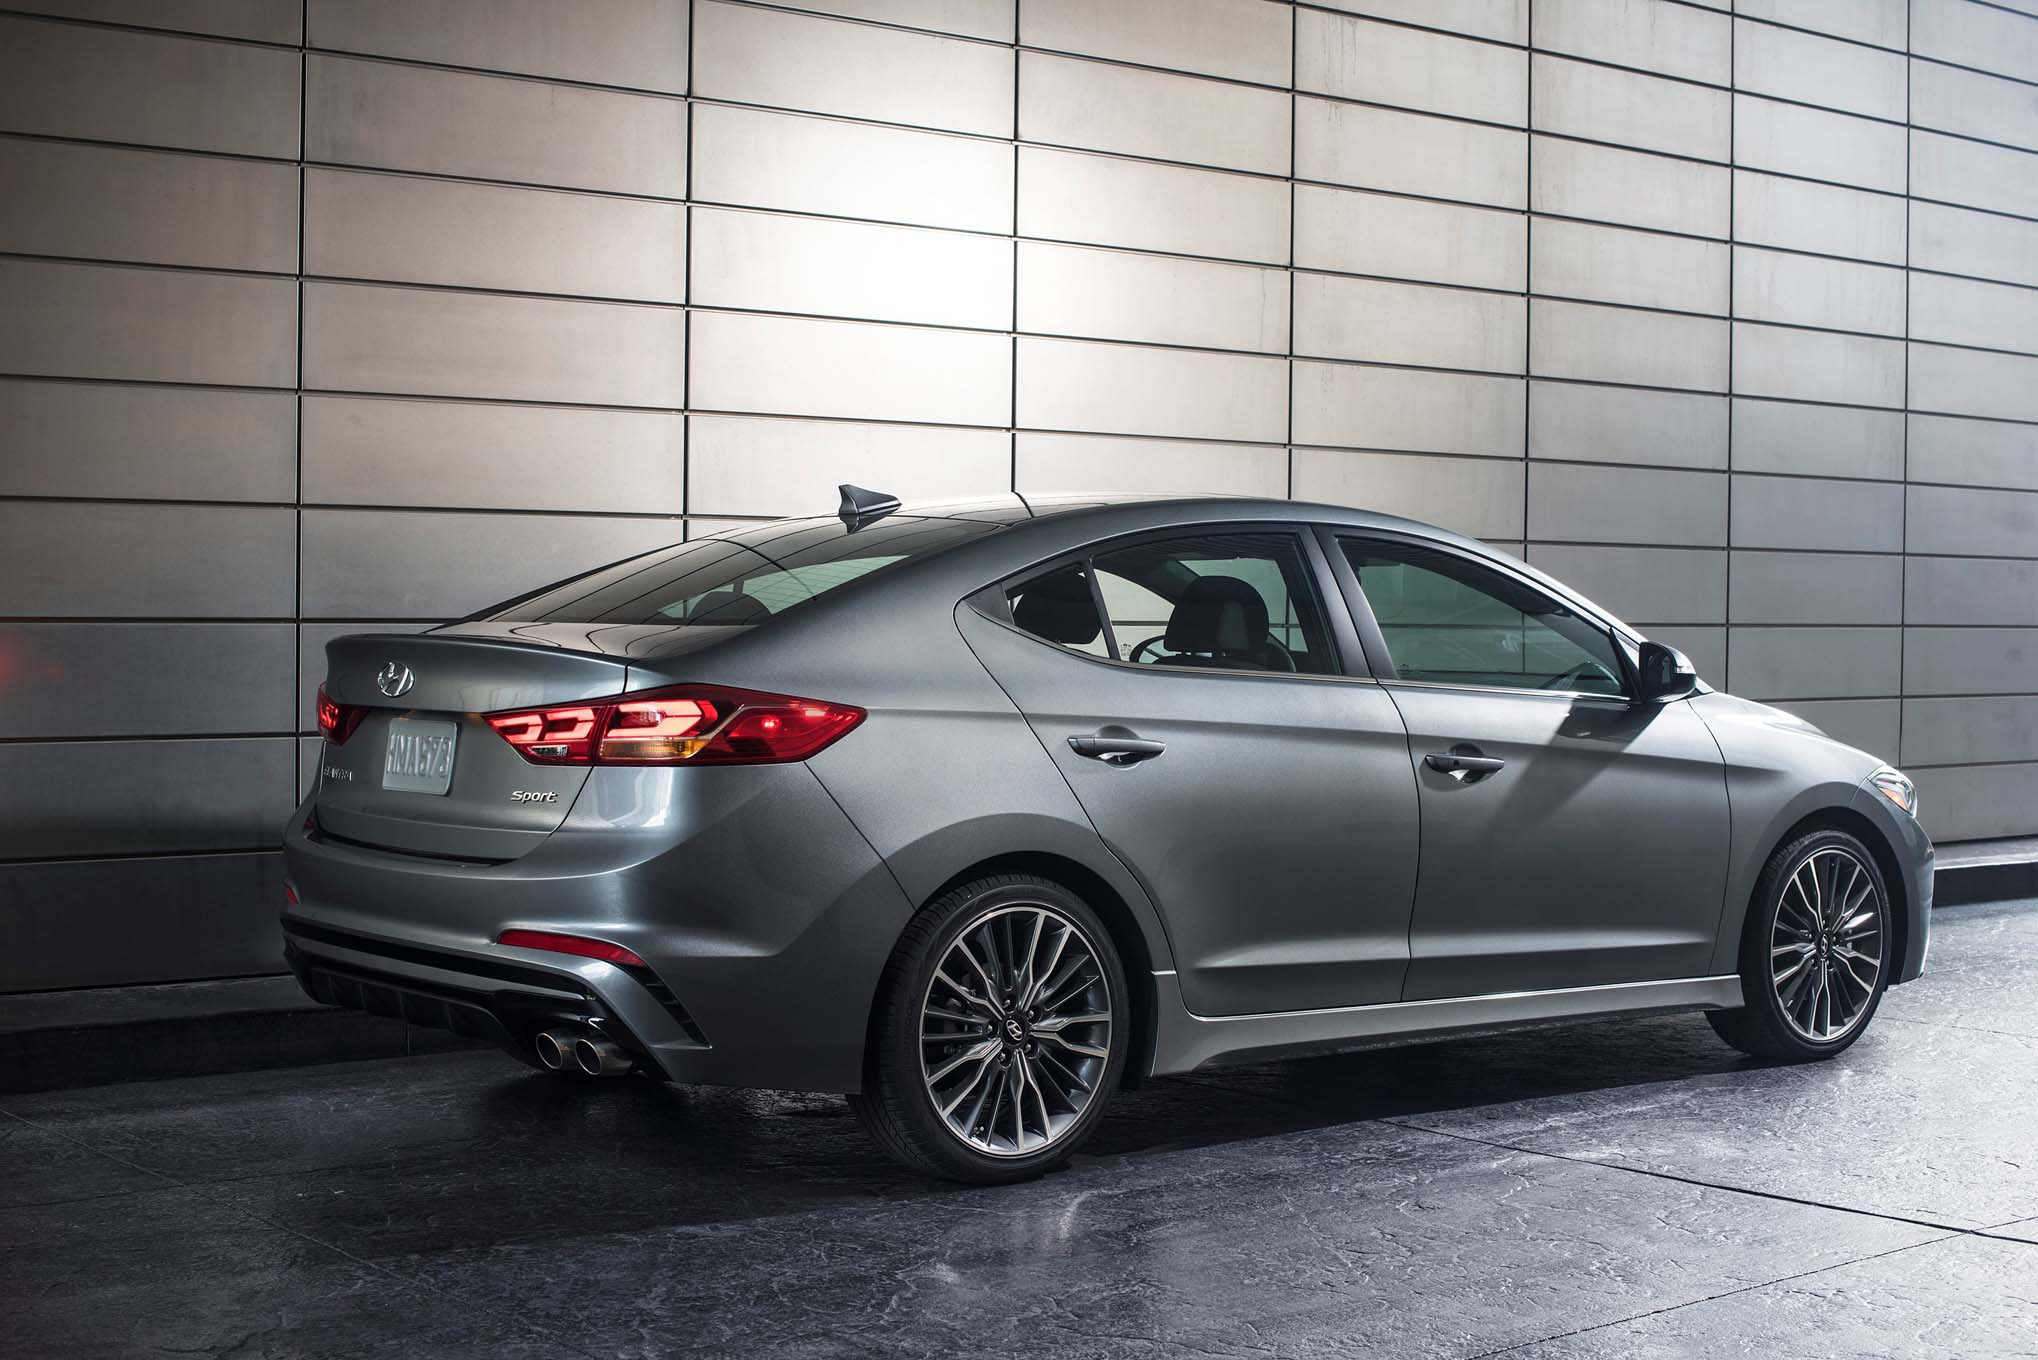 2017 Hyundai Elantra 0-60 | Best new cars for 2018